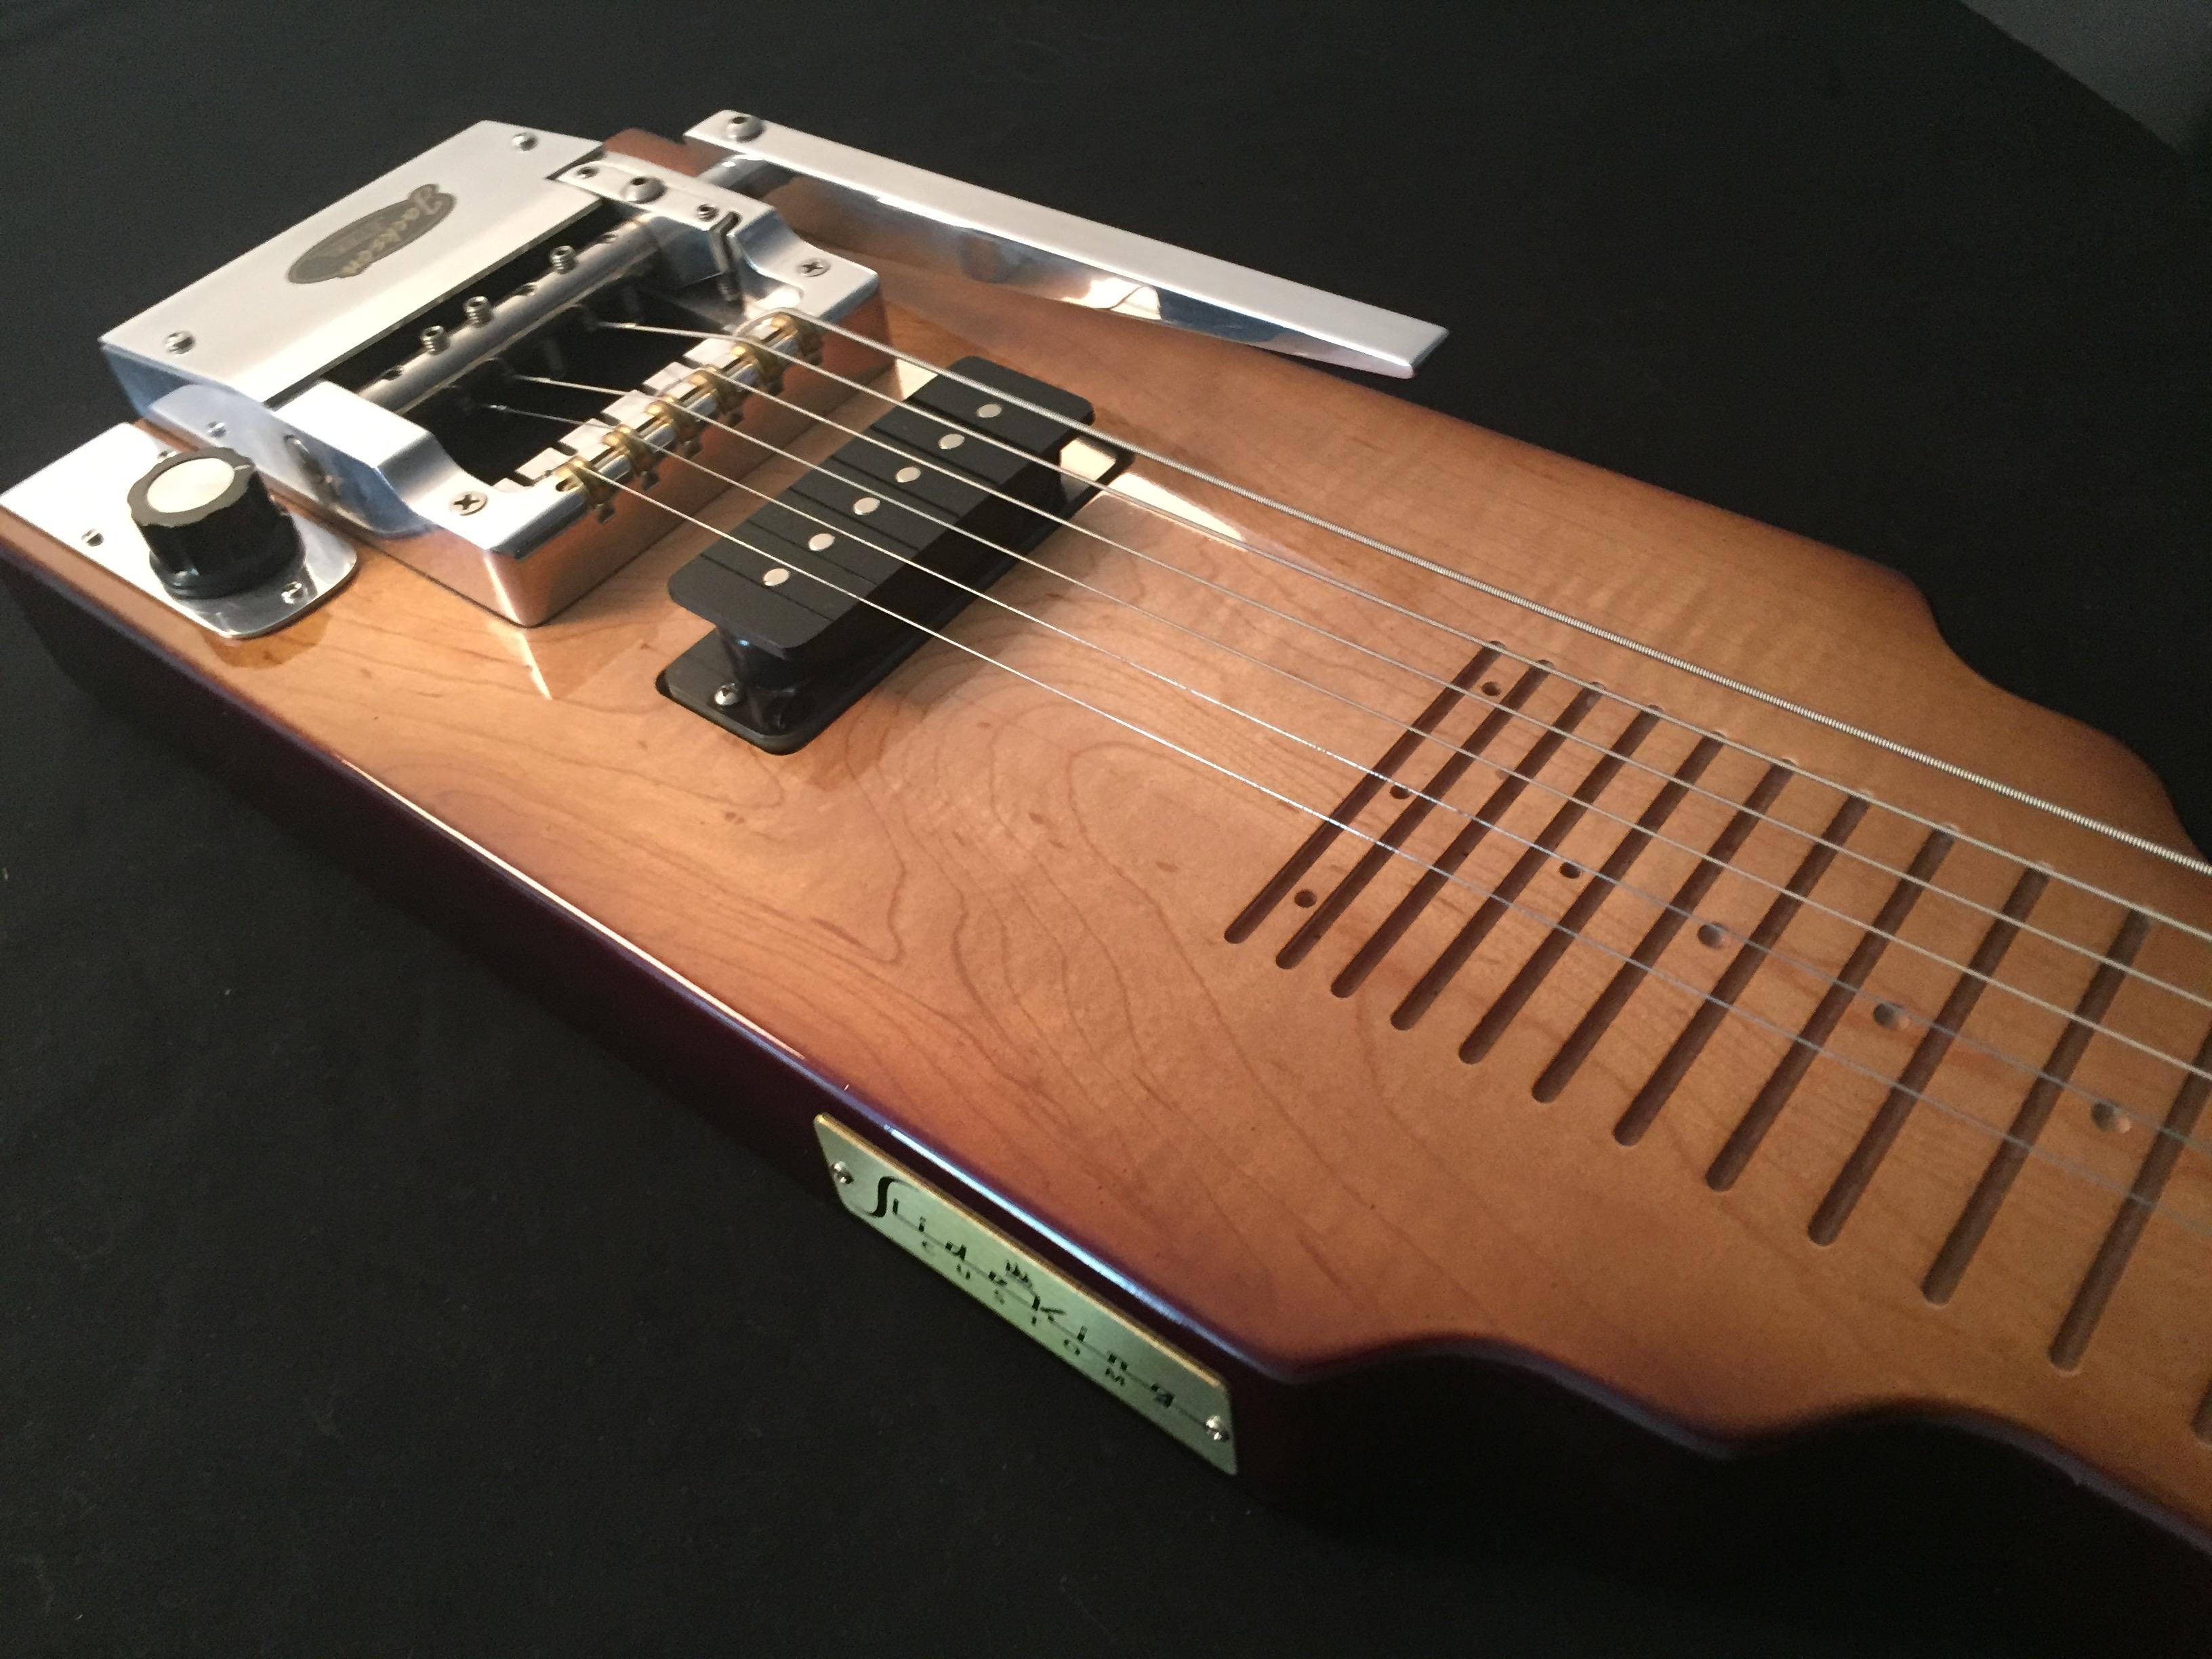 Lap Steel Guitars   SlideKing LS Lap Steel Guitar with The EDGE®